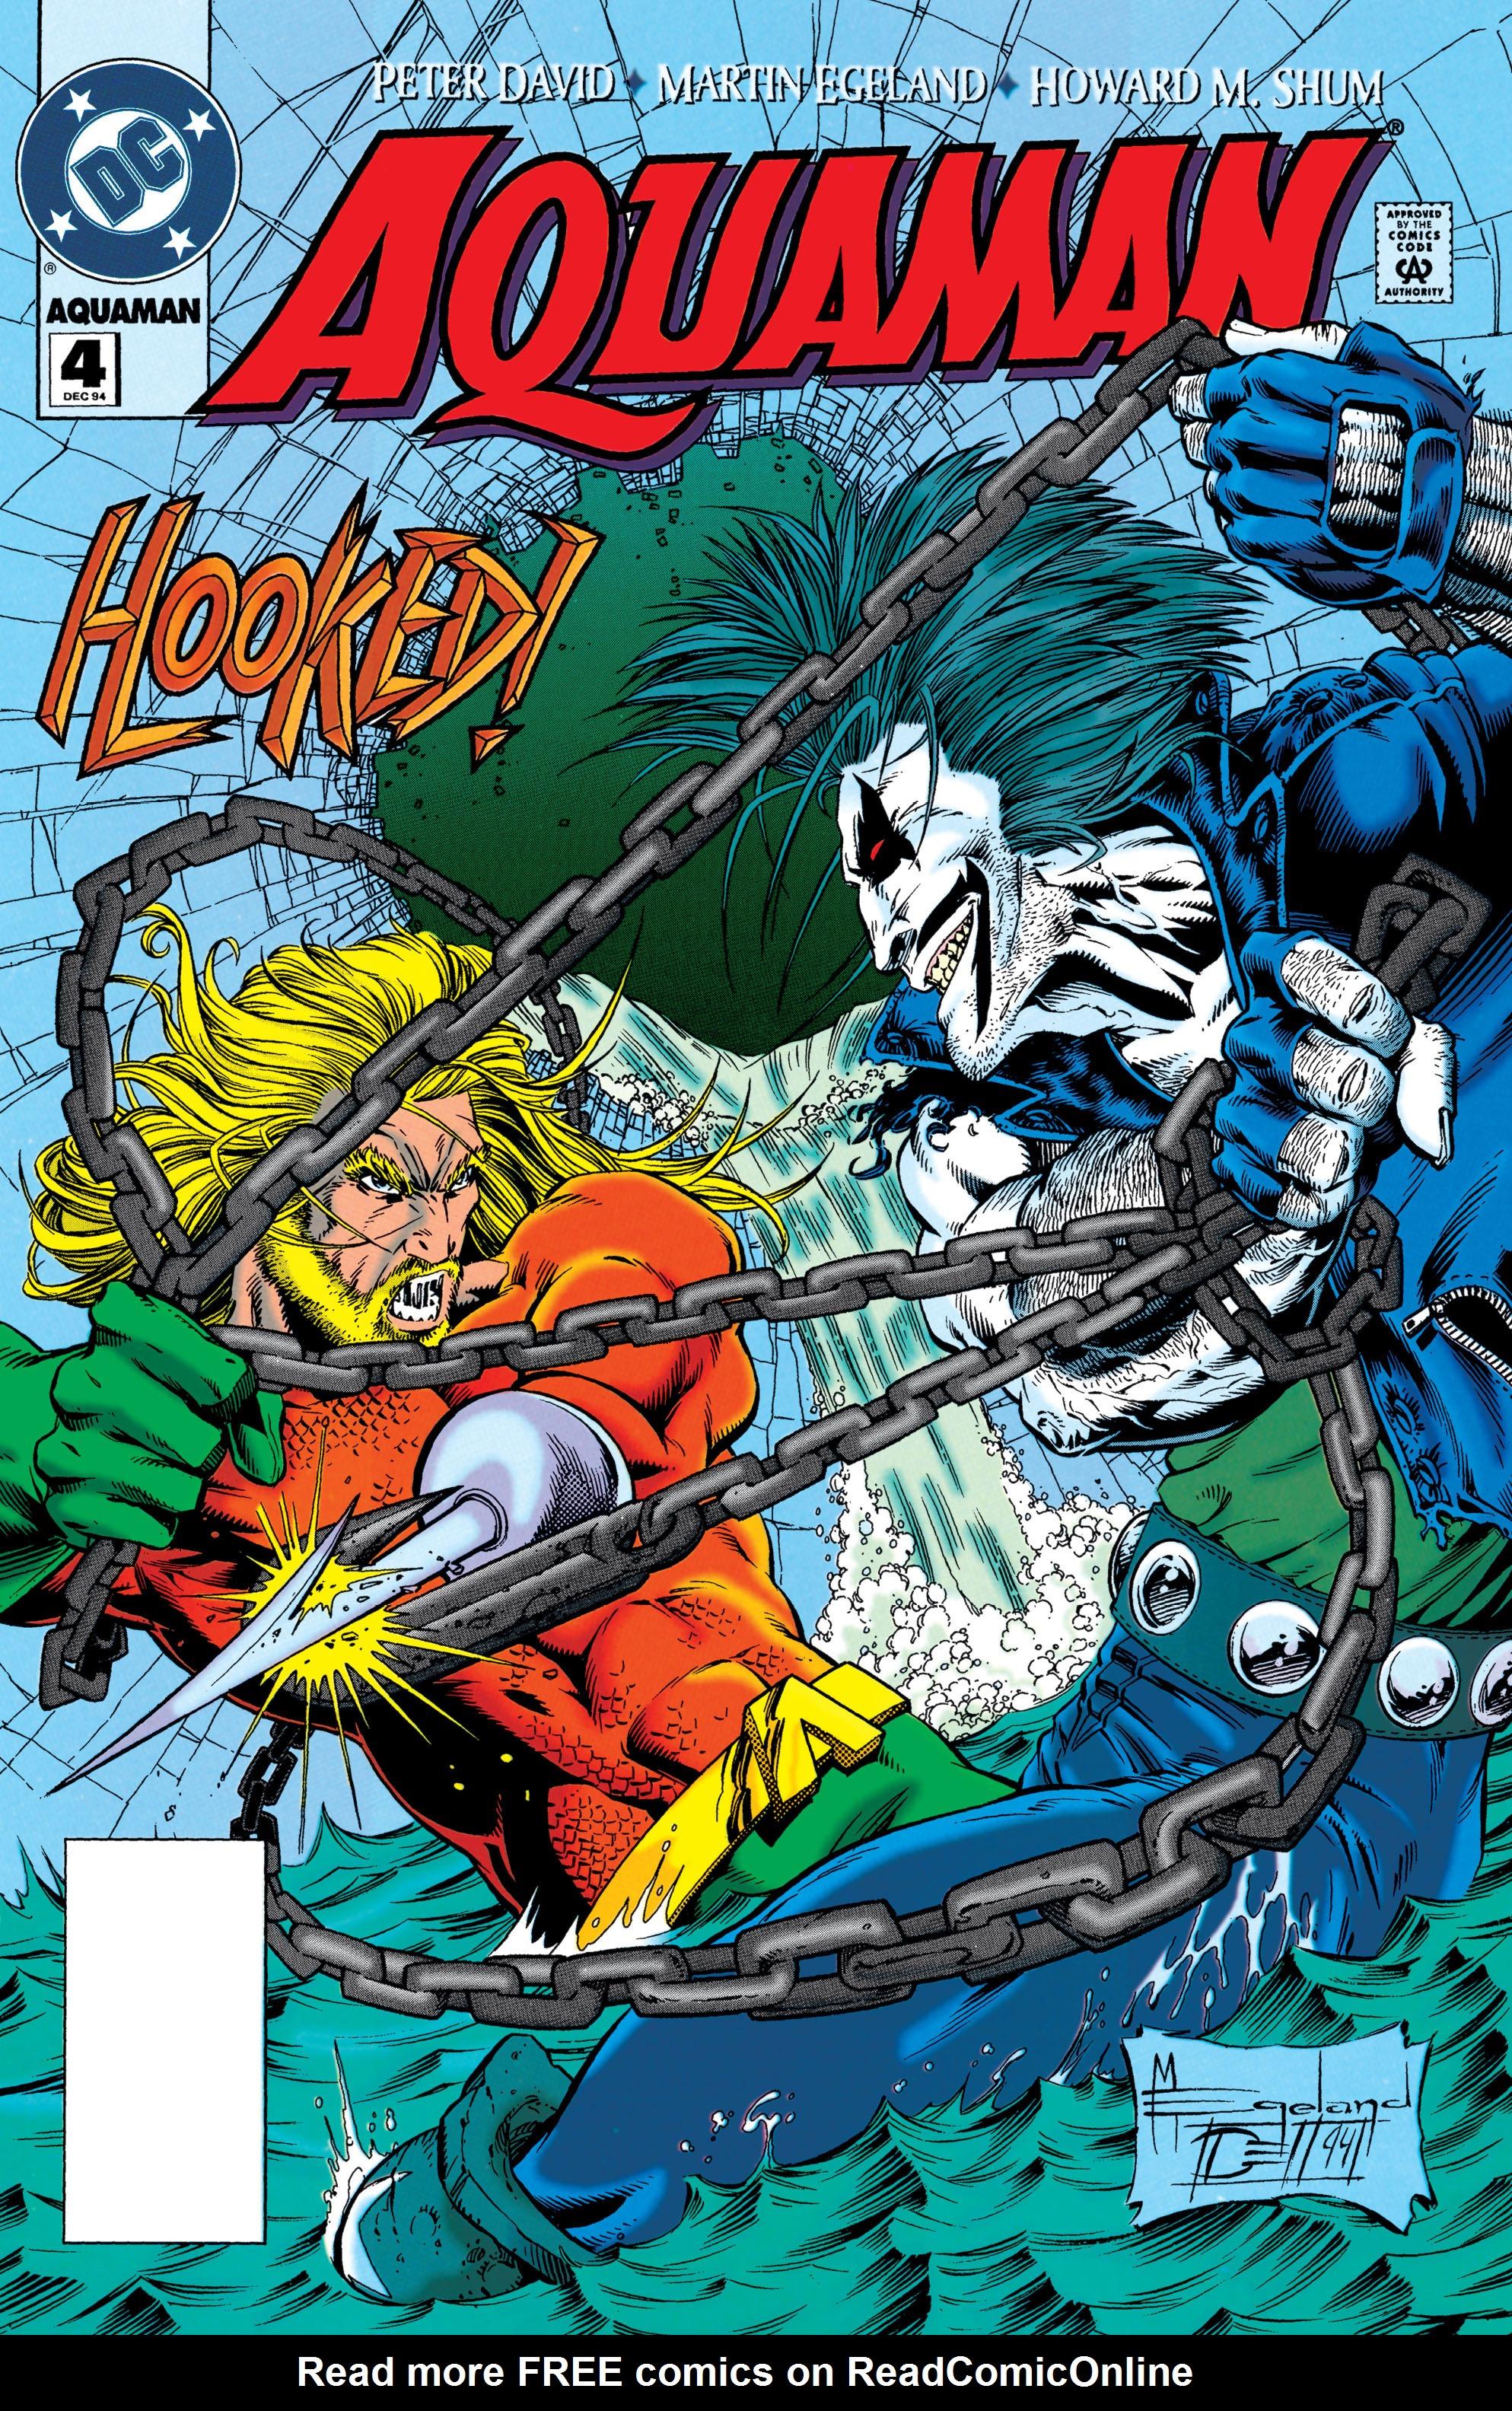 Read online Aquaman (1994) comic -  Issue #4 - 1